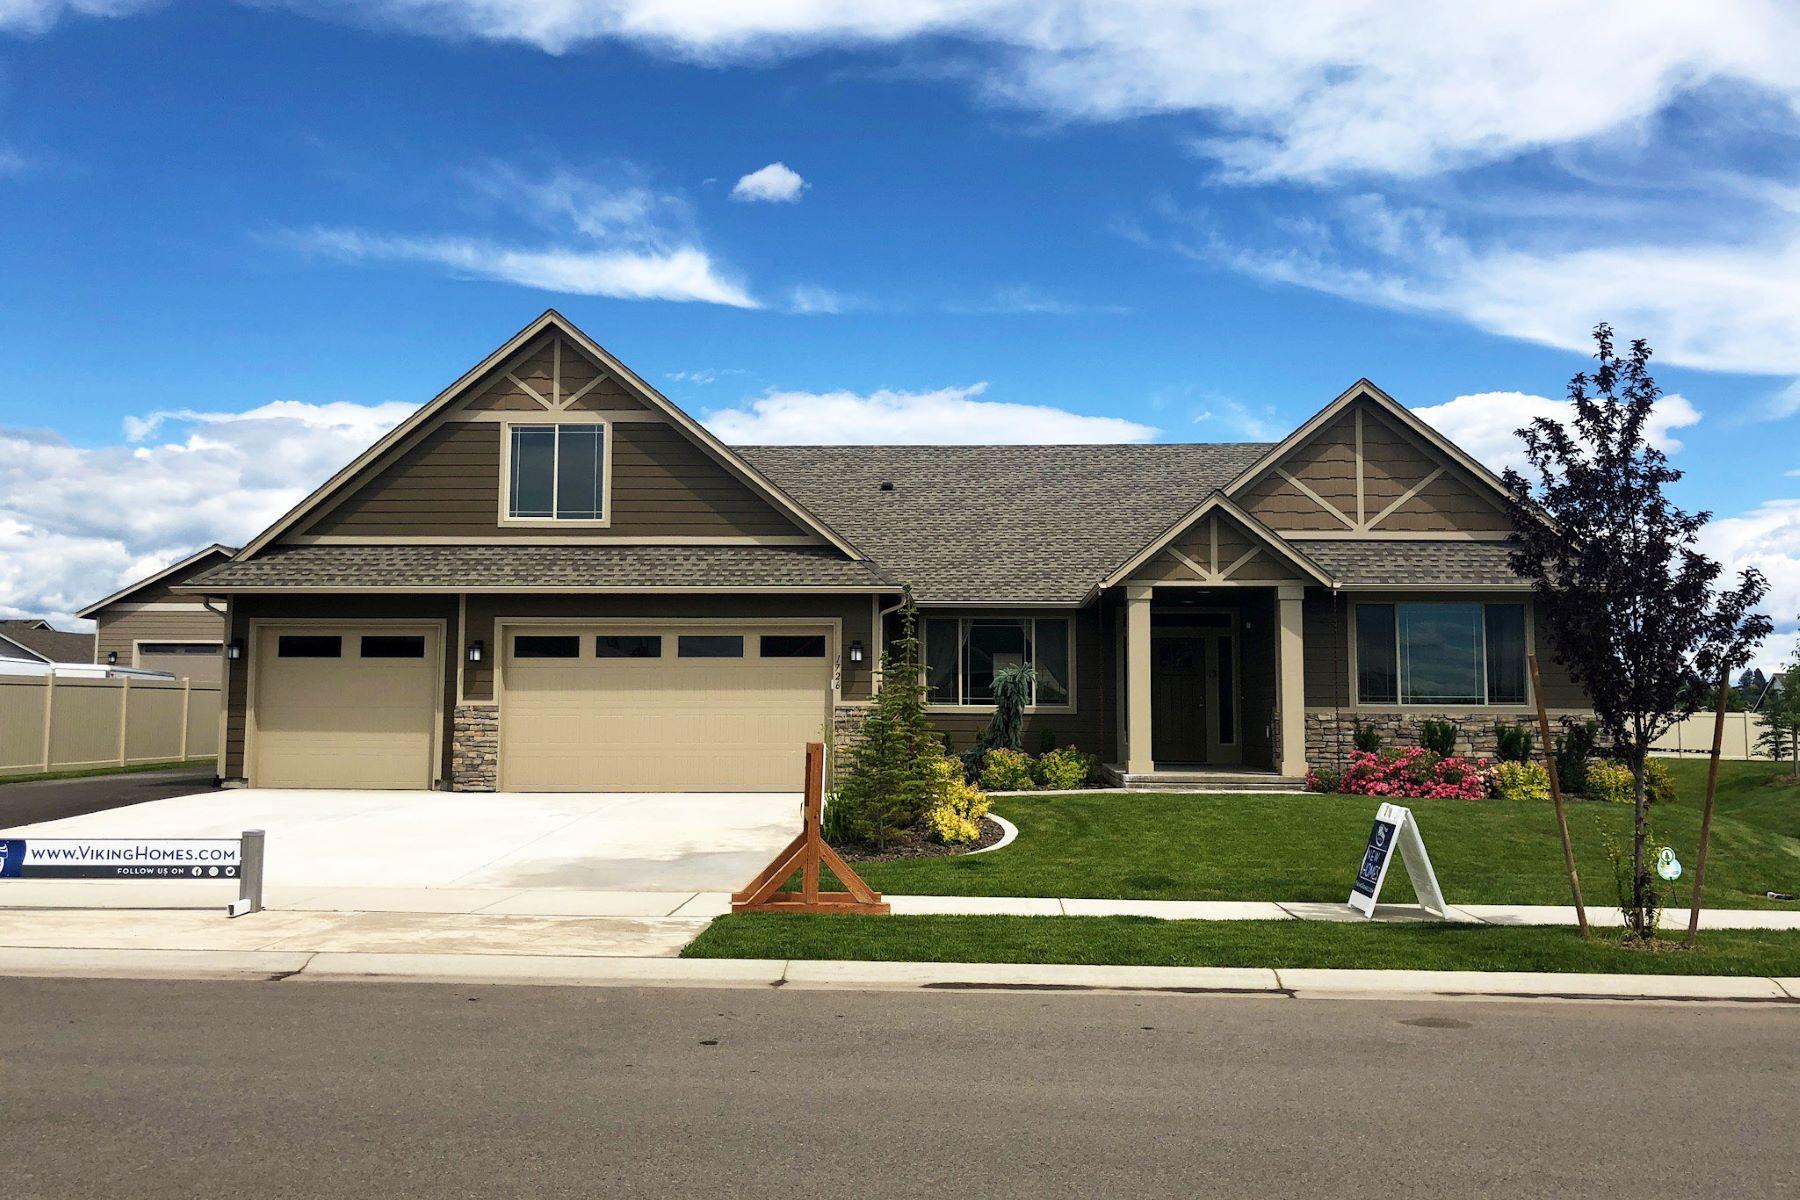 Single Family Homes for Sale at Viking Builders Victoria bonus floor plan! 537 Summerview Lane Richland, Washington 99352 United States